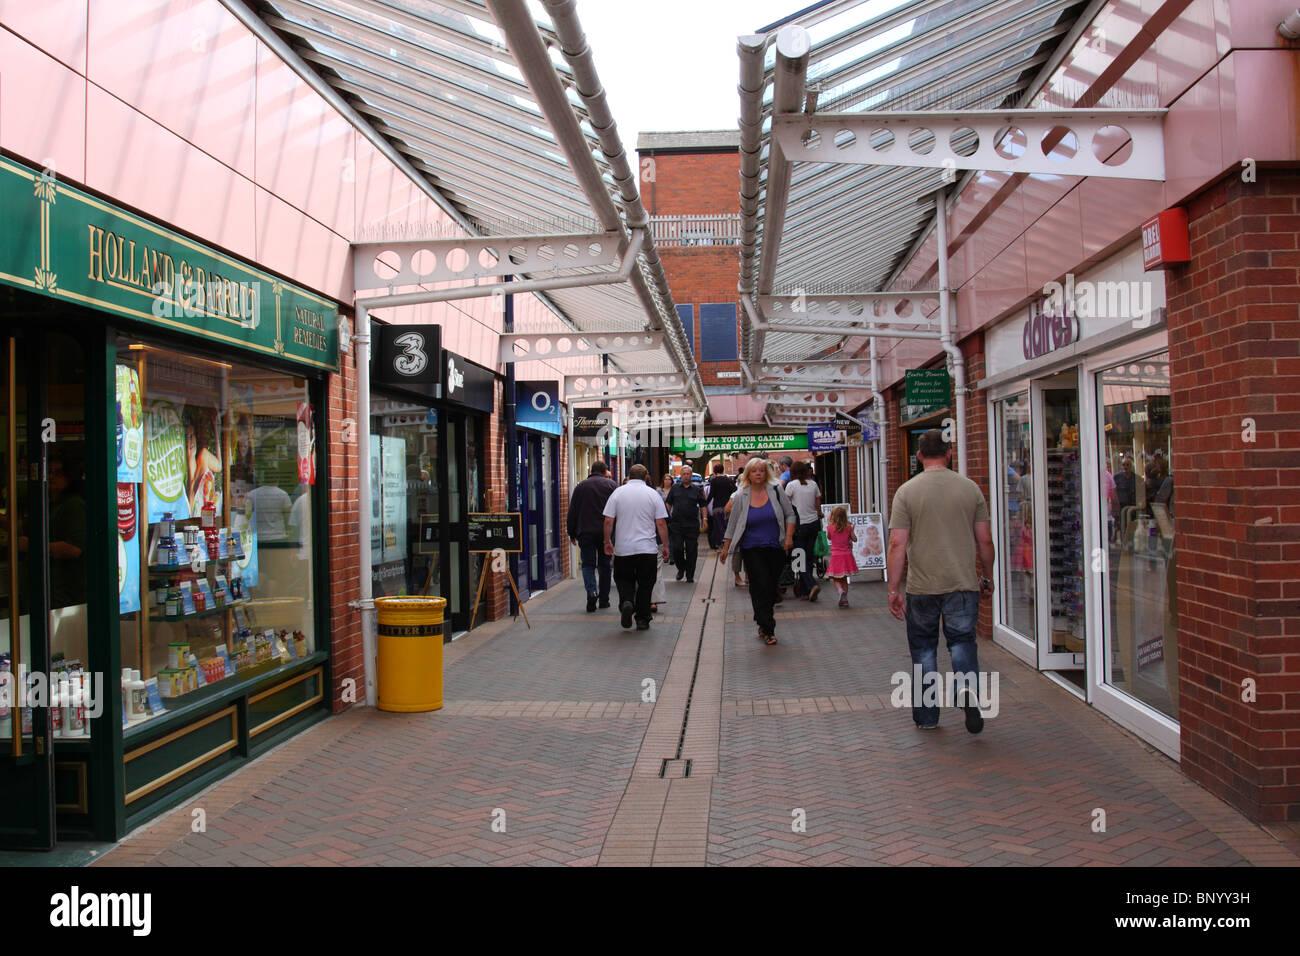 A shopping precinct in Grantham, Lincolnshire, England, U.K. - Stock Image